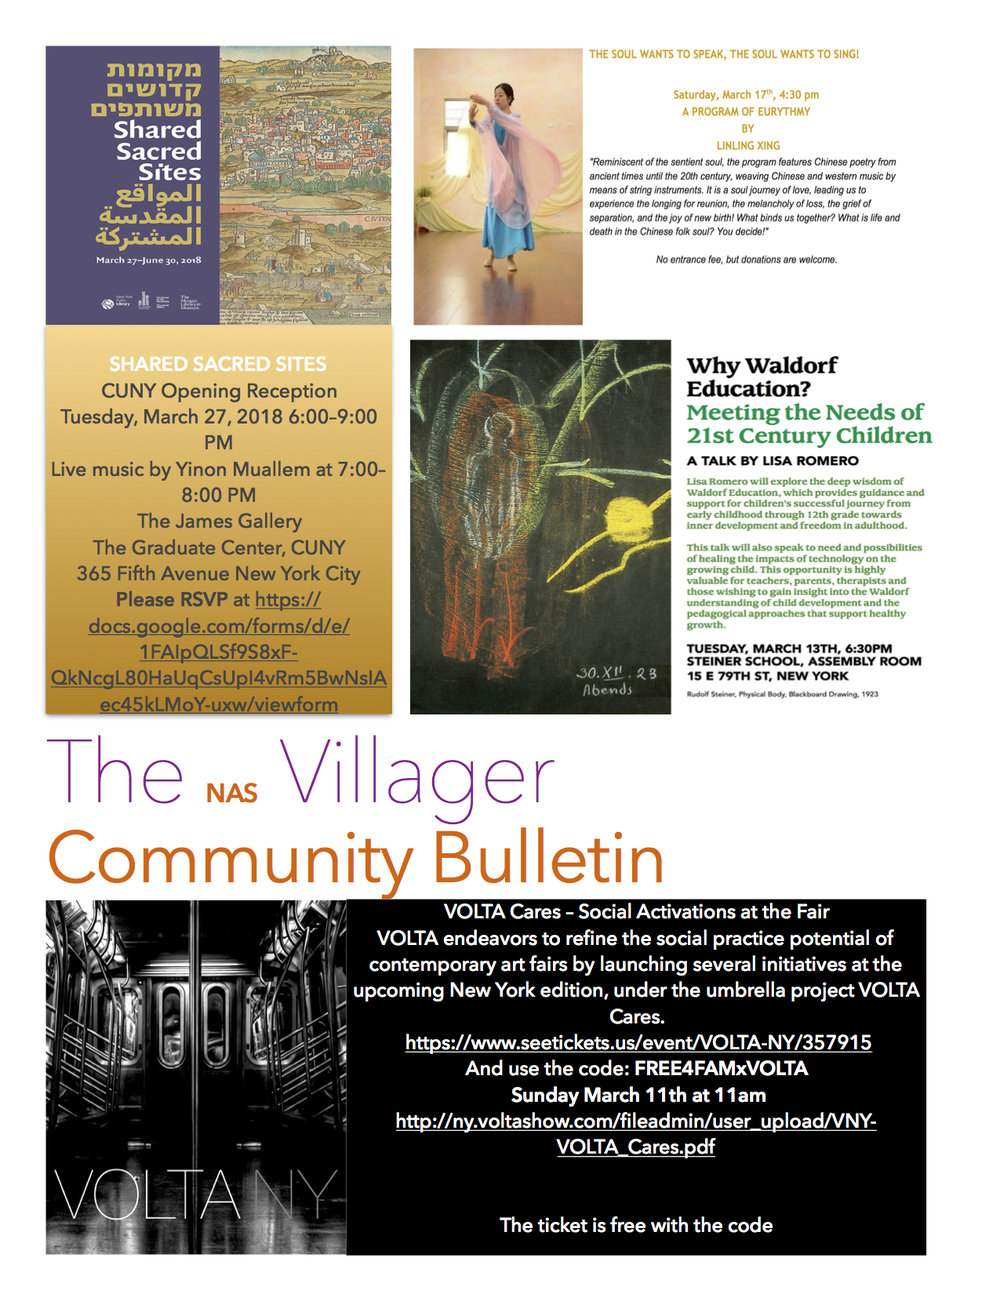 Community Enrichment — New Amsterdam School